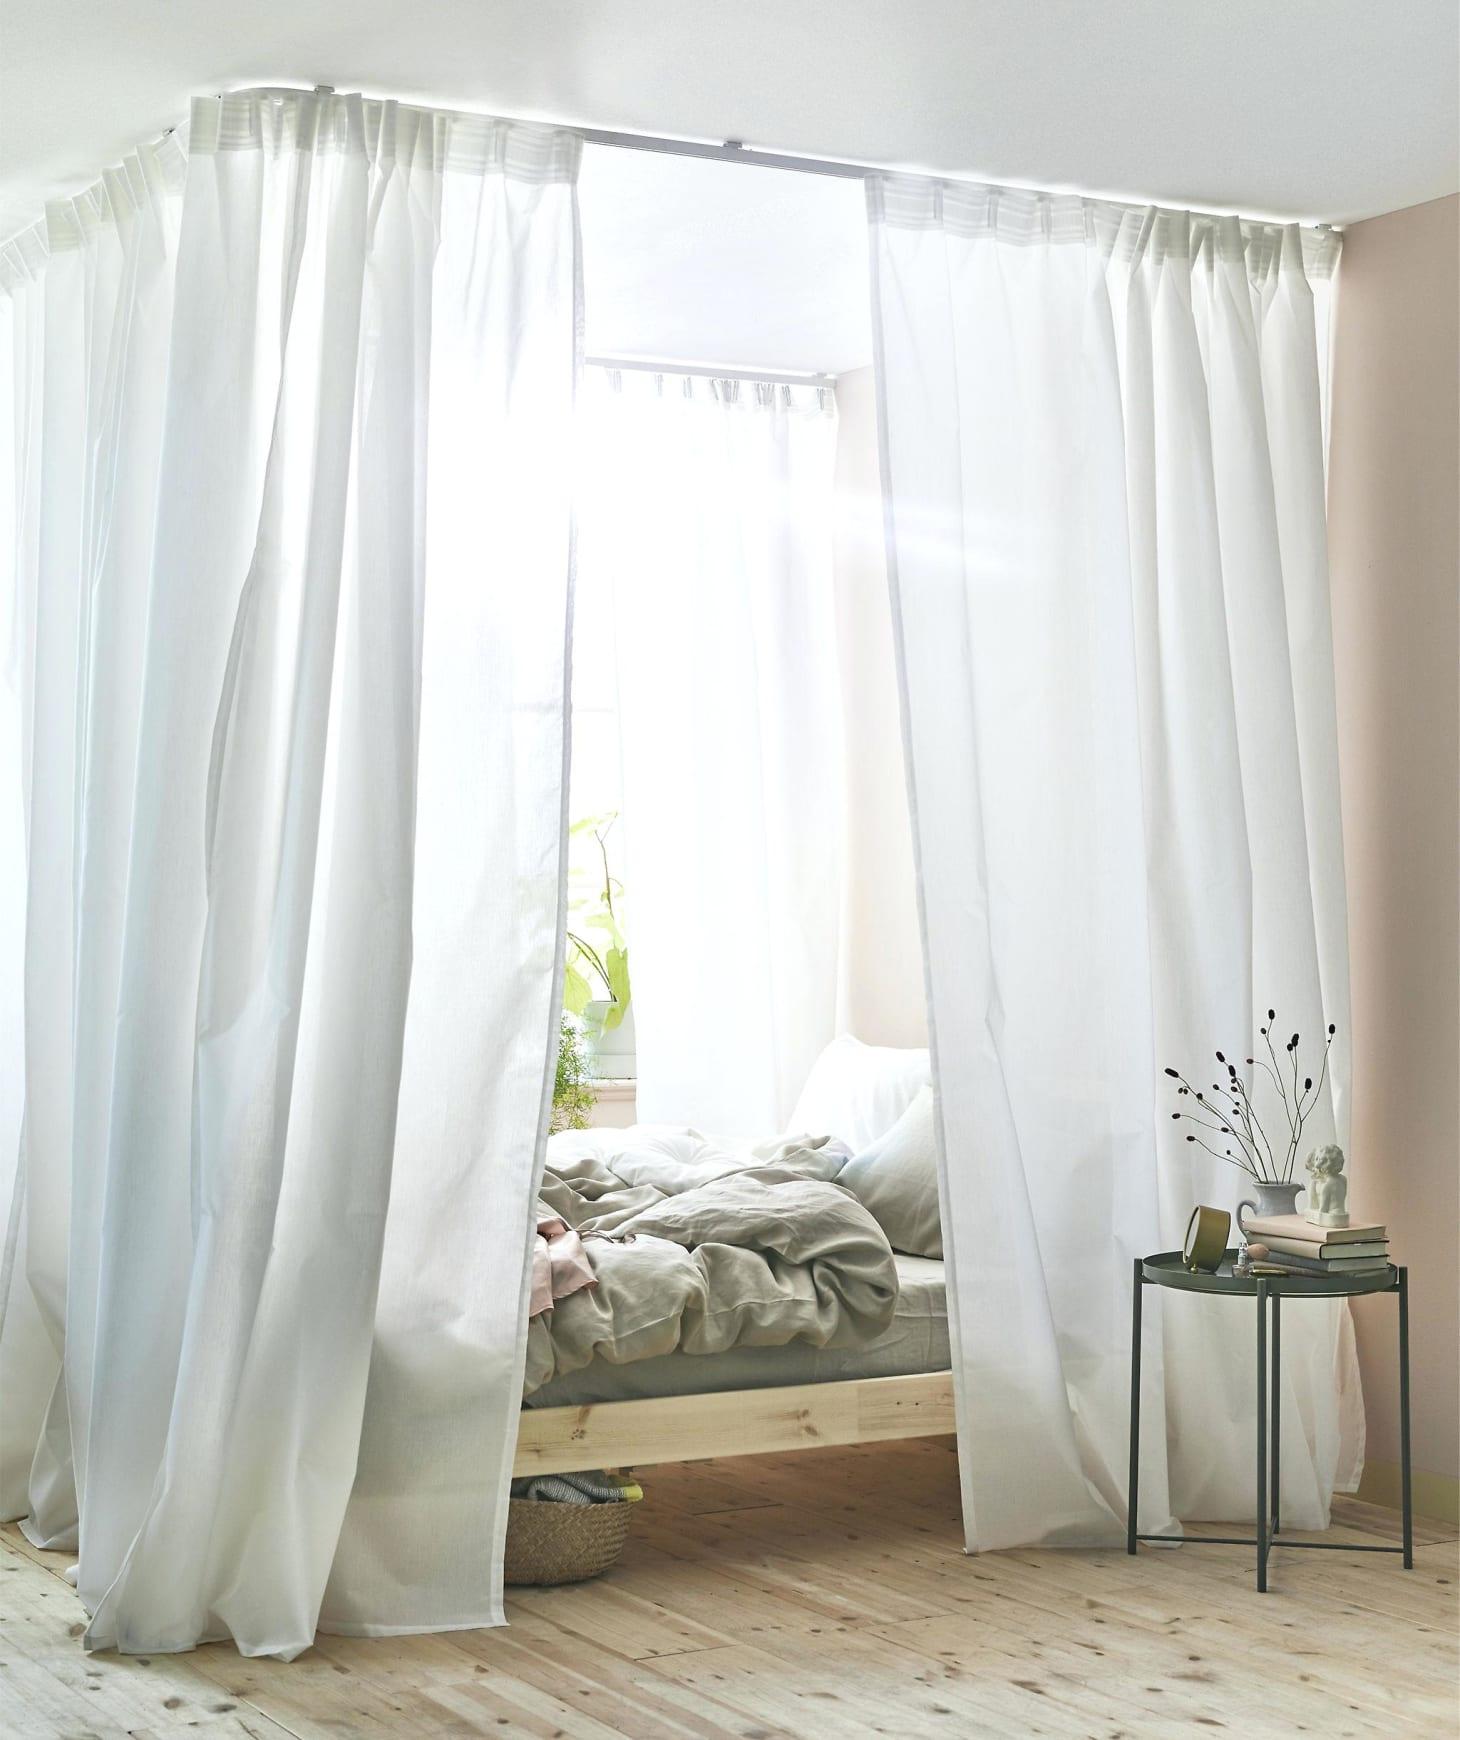 . IKEA Hacks   DIY Platform Bed  Curtains  Storage   Apartment Therapy